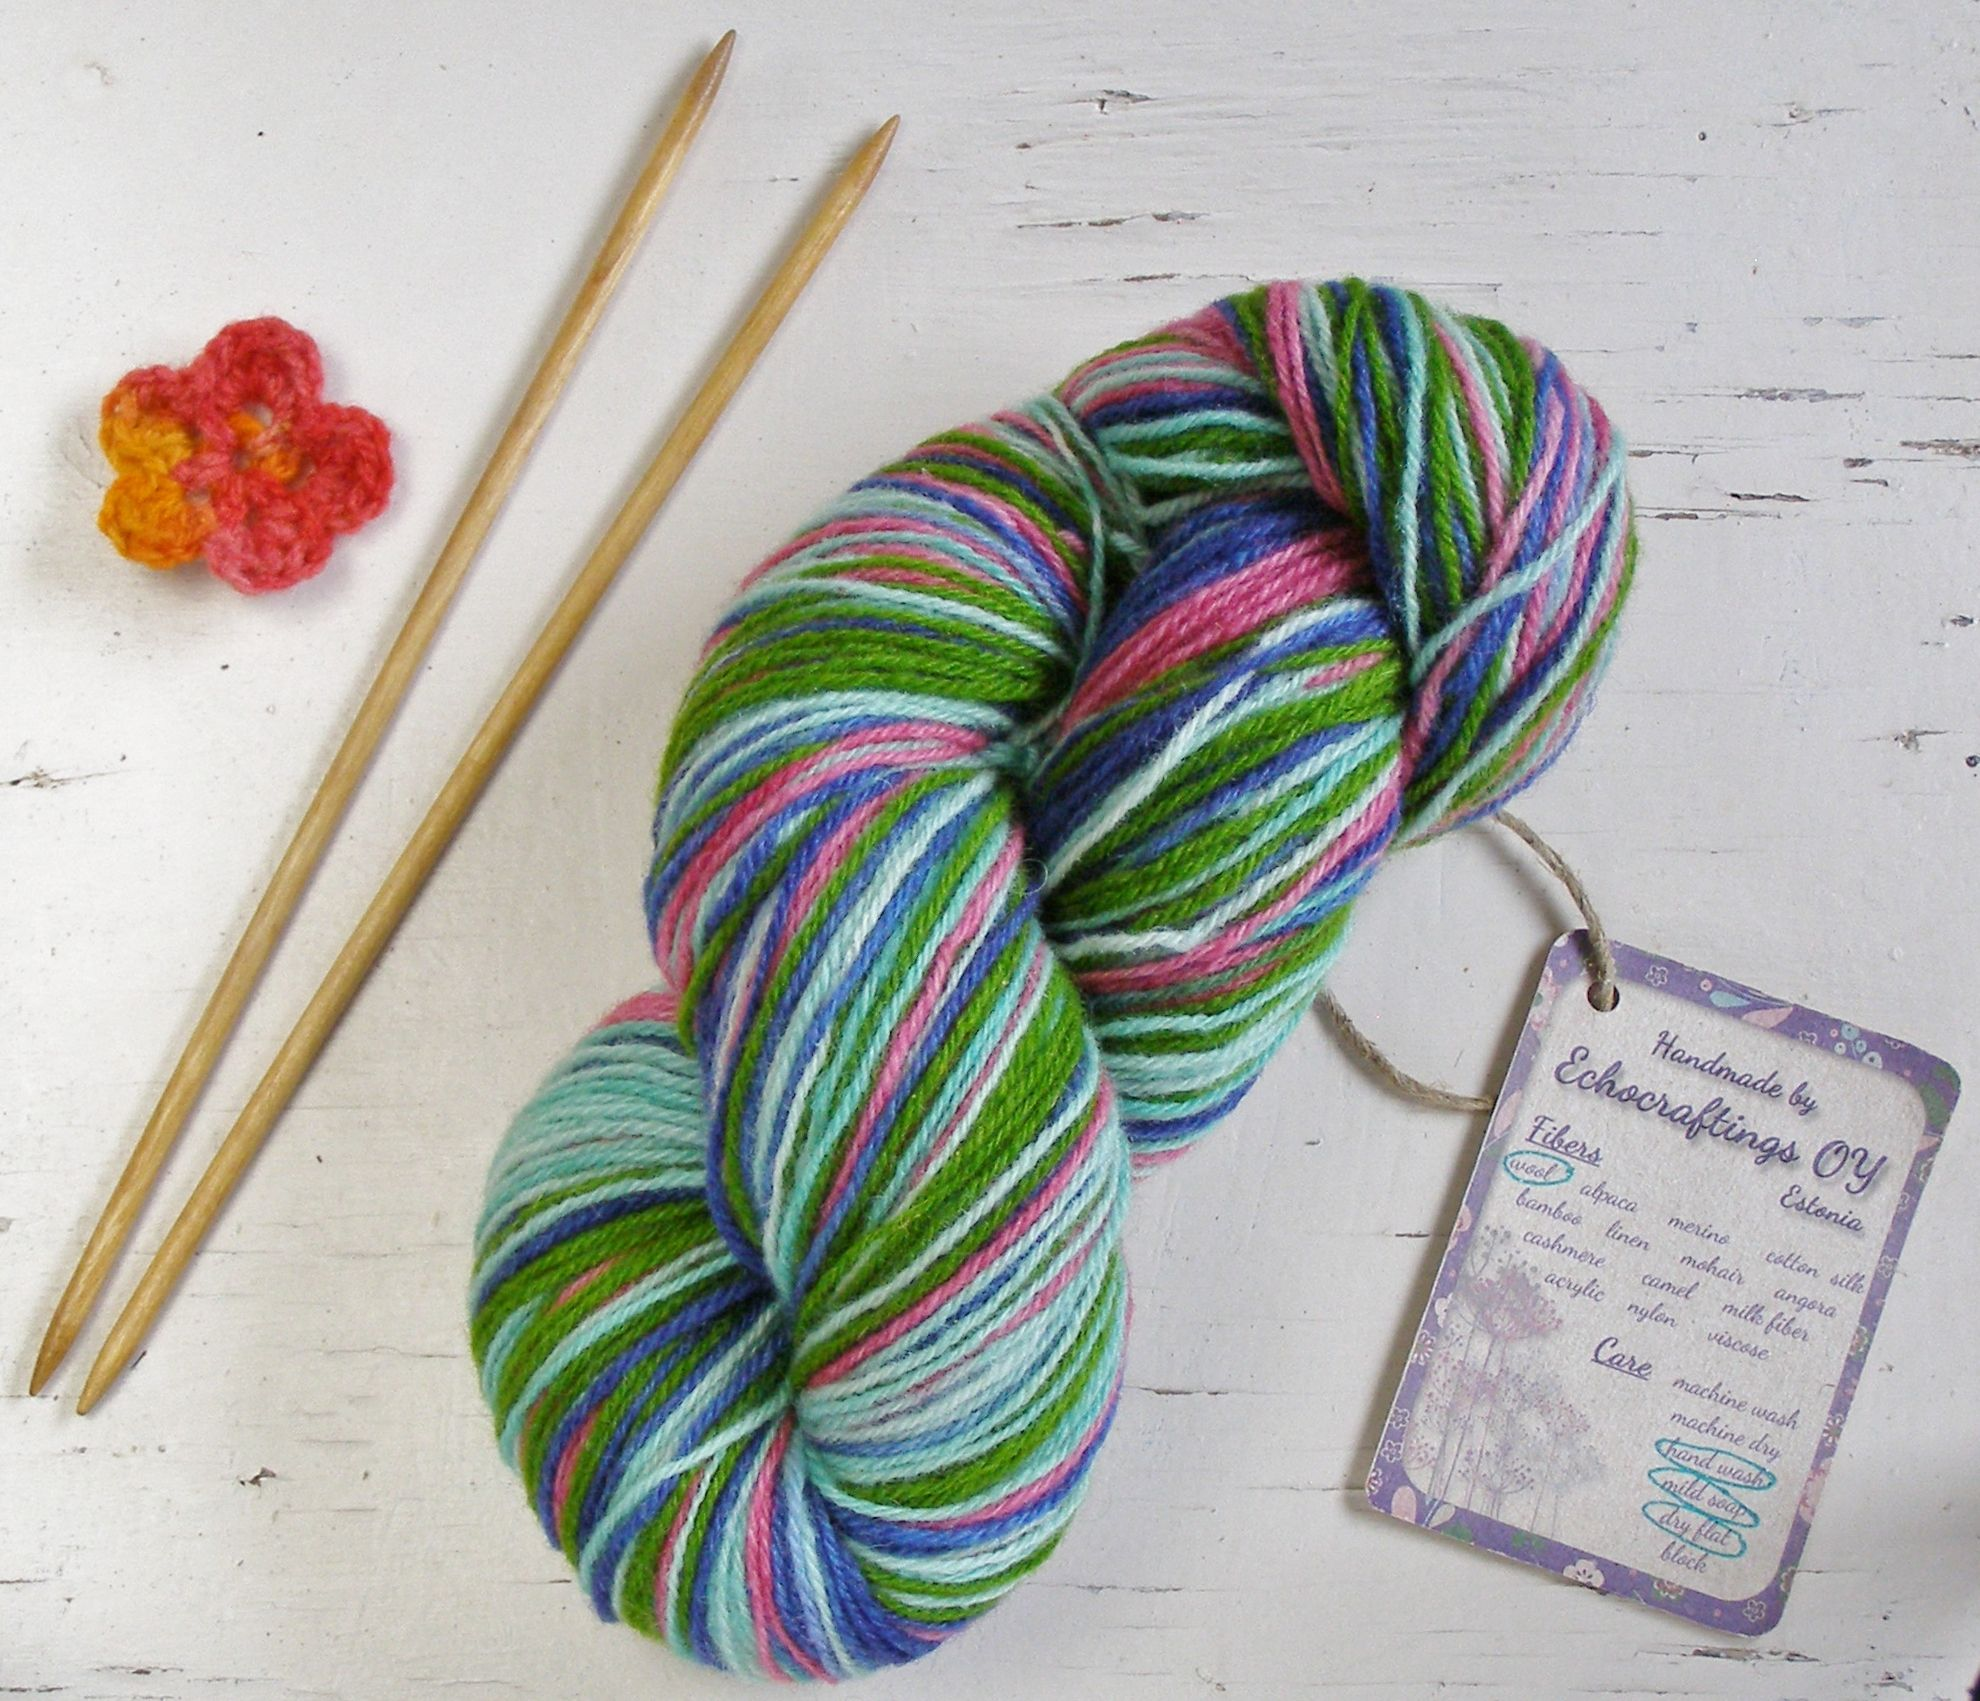 Crochet Supplies Estonian Wool Present Under 15 Mint Green Knitting Kit Craft Supply Wool Yarn Present For Granny Long Yarn Etsy Crafts Hand Dyed Yarn